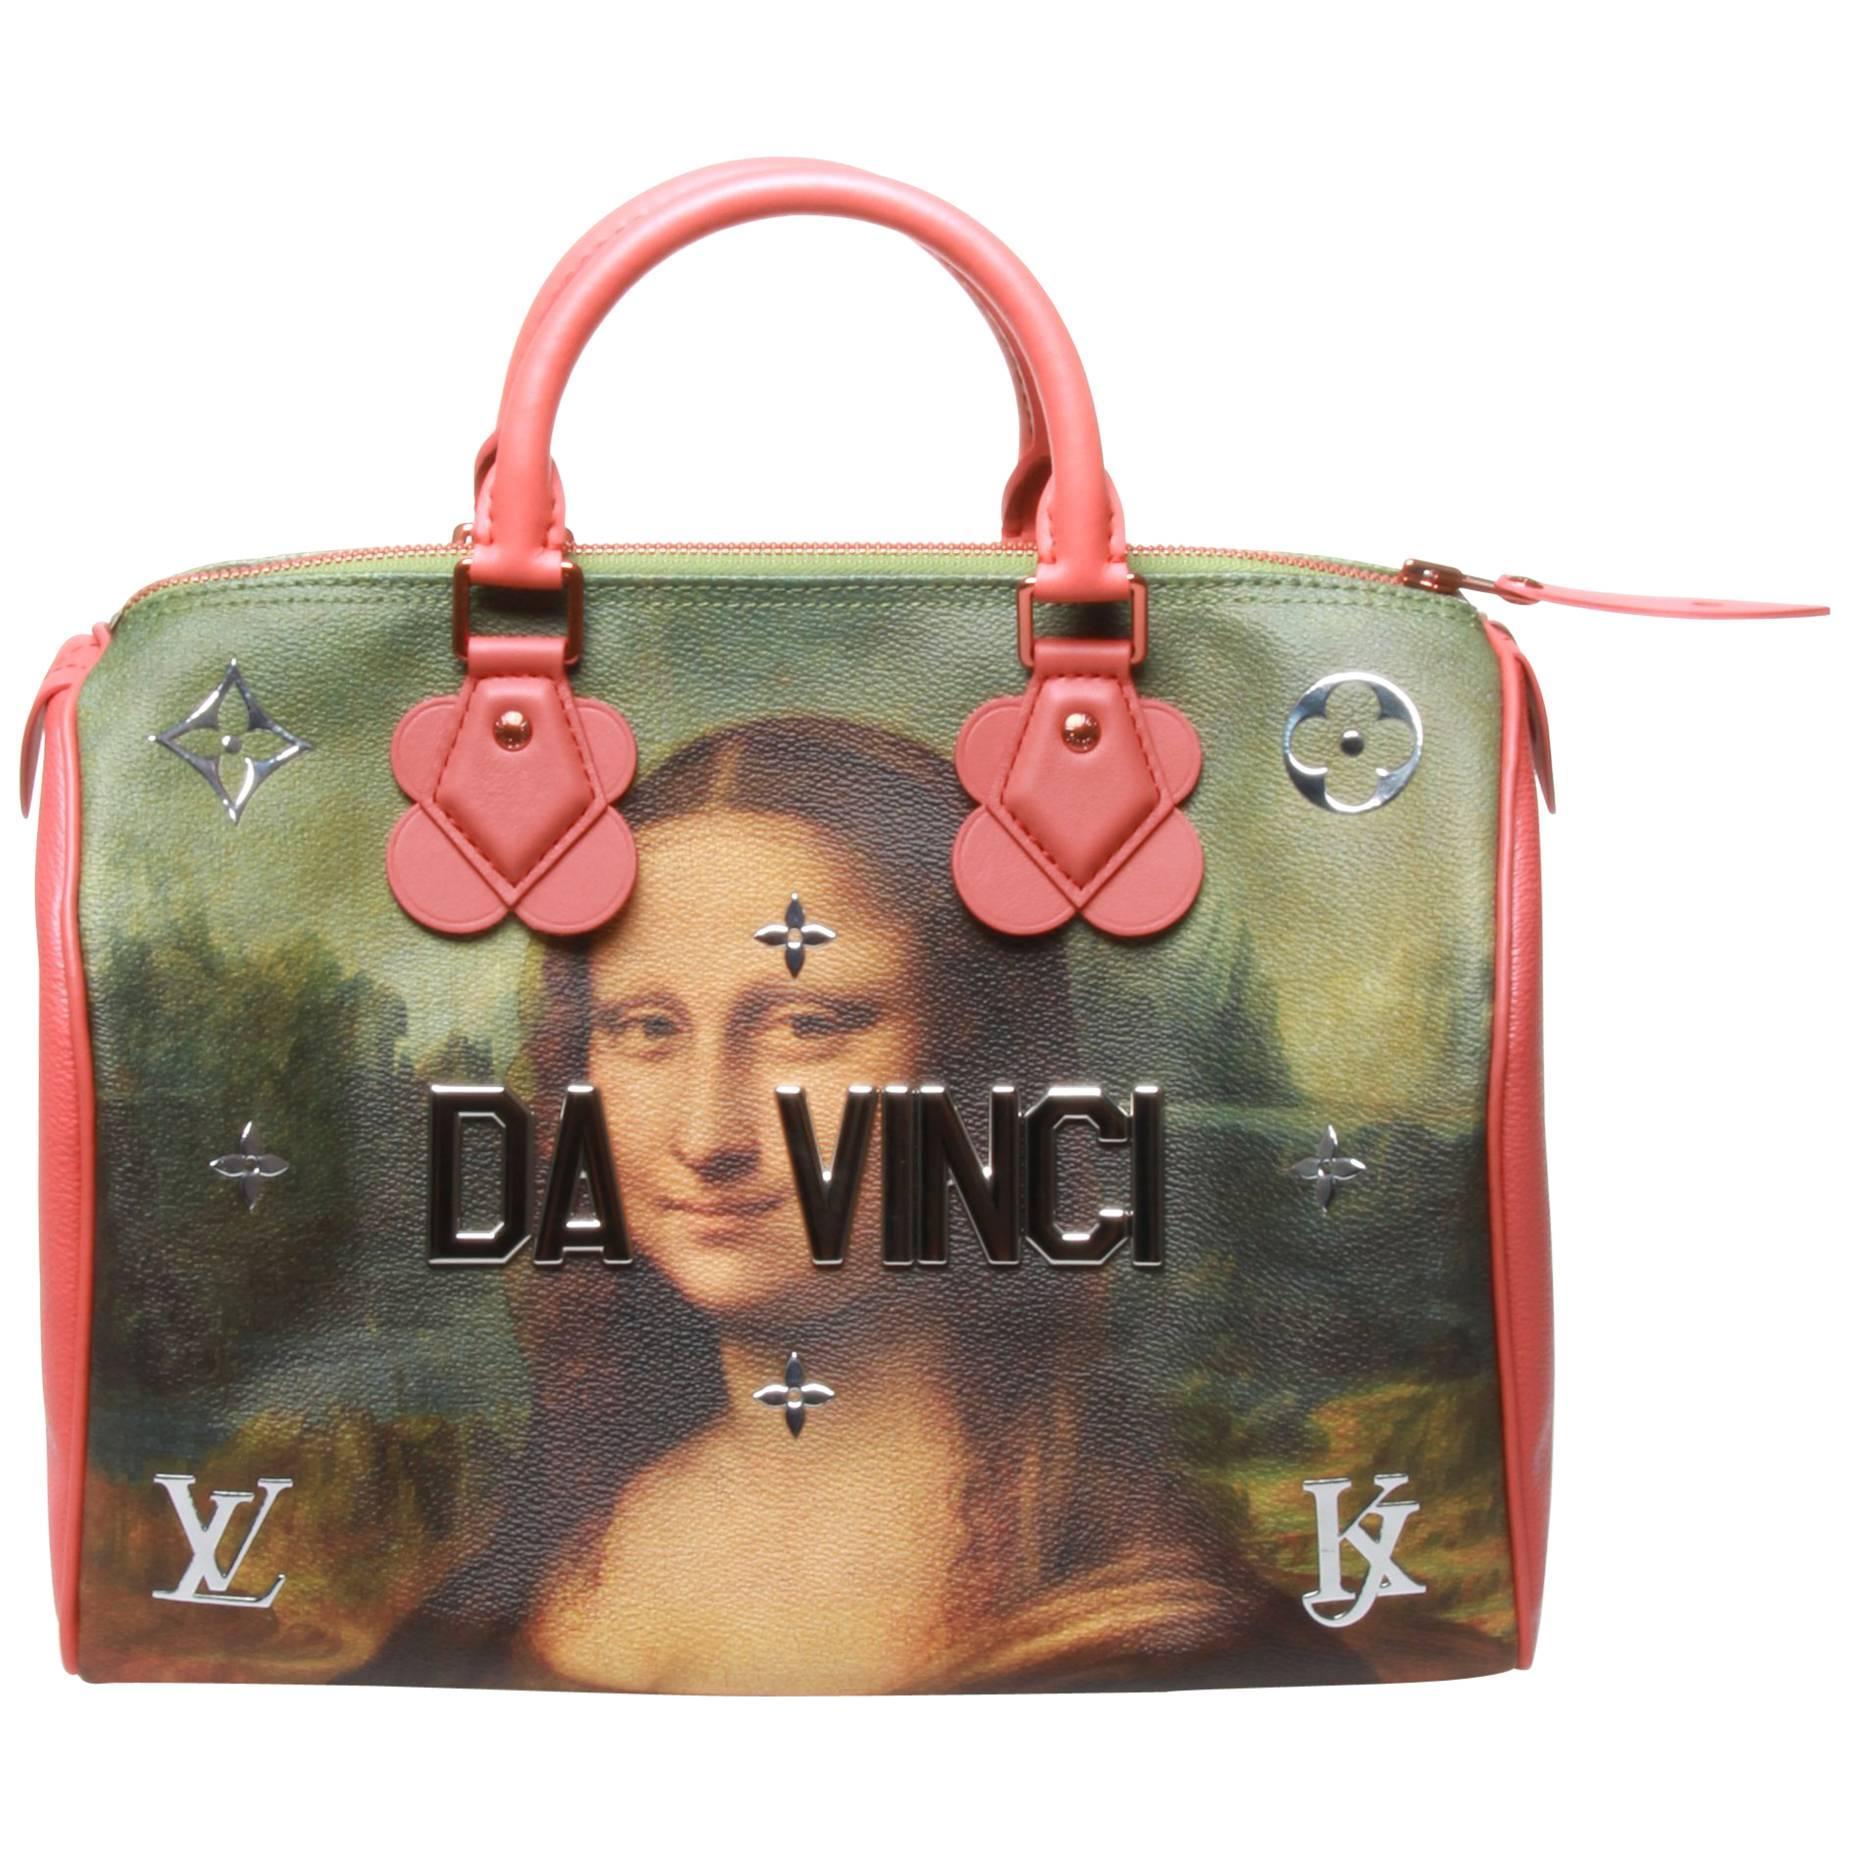 Louis Vuitton Lv X Koons Masters Da Vinci Speedy 30 Bag RzoNLakFcx